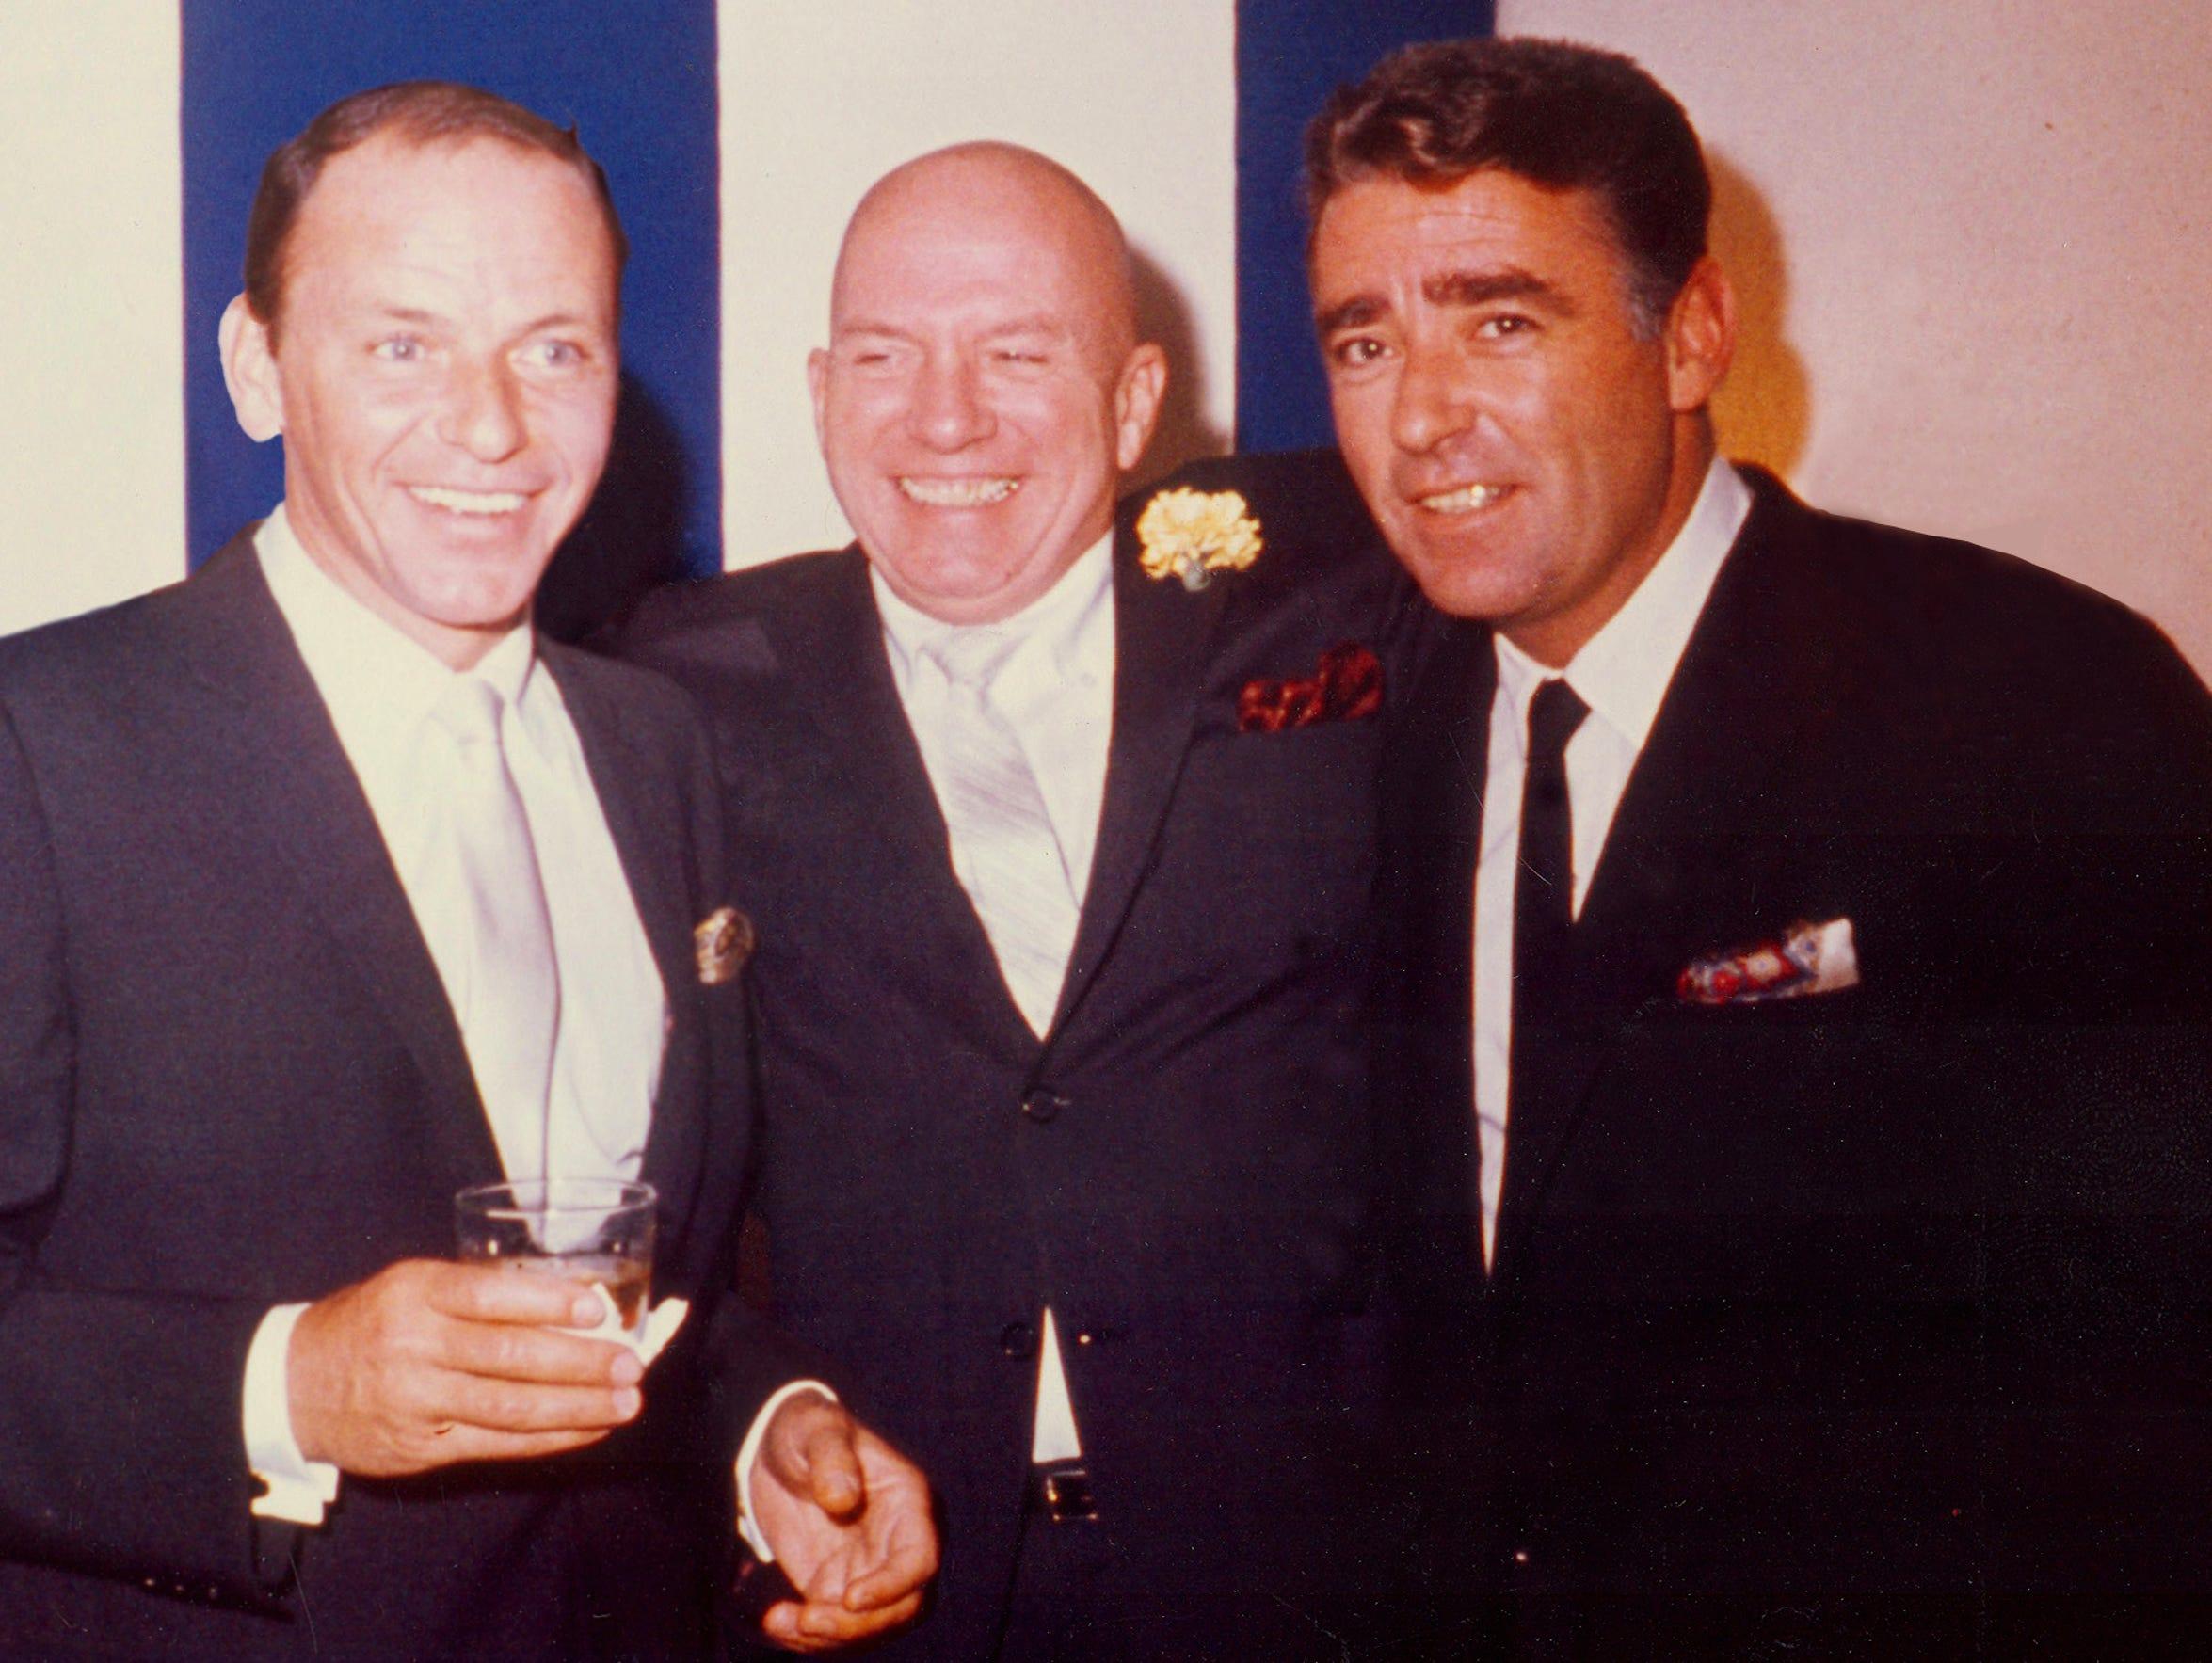 Frank Sinatra (from left), Jimmy Van Heusen and Peter